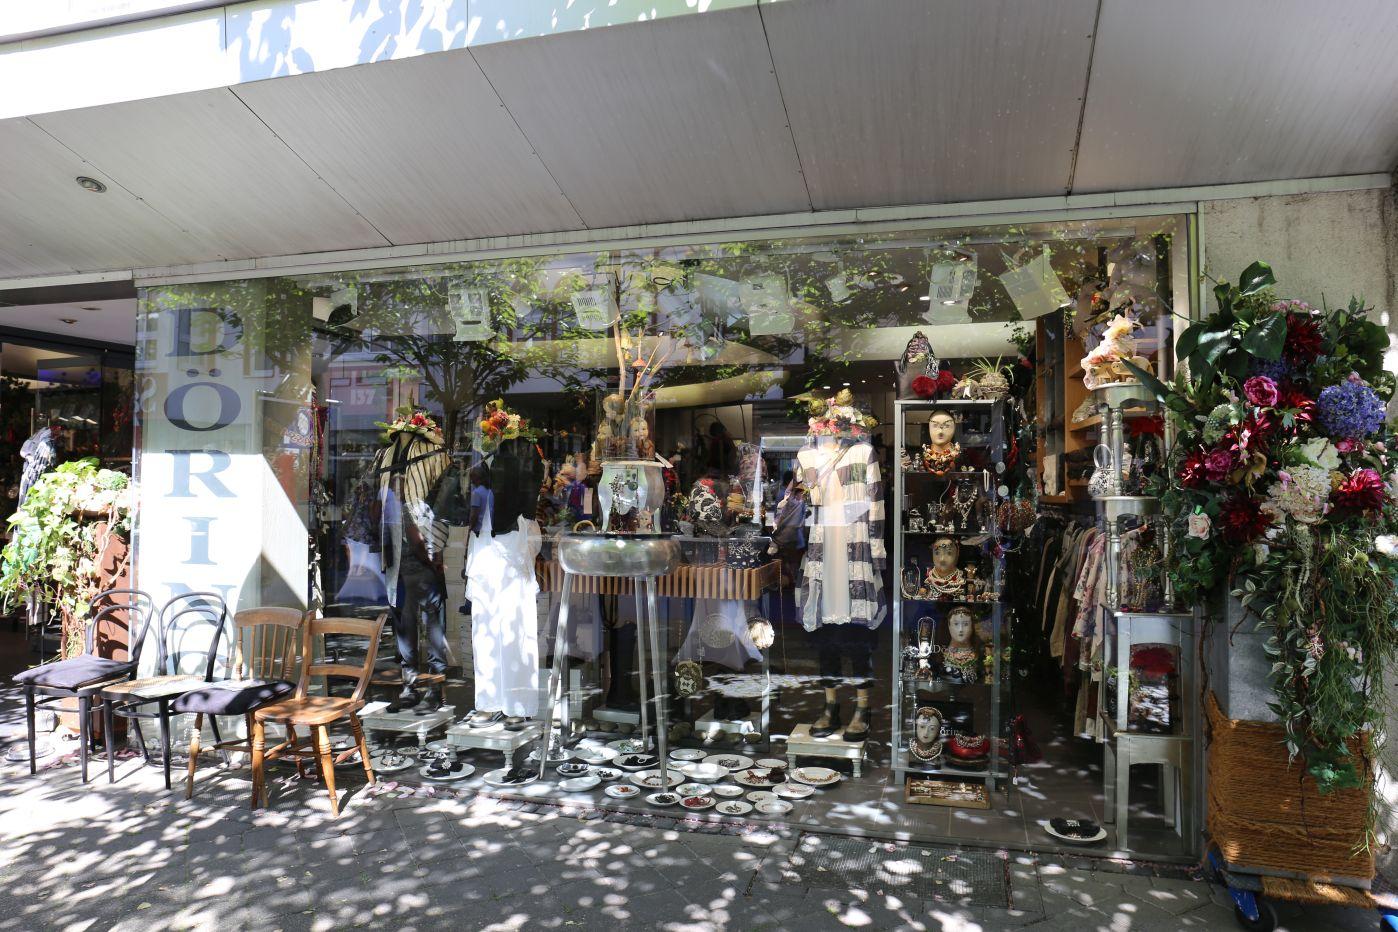 Doering boutique(17)